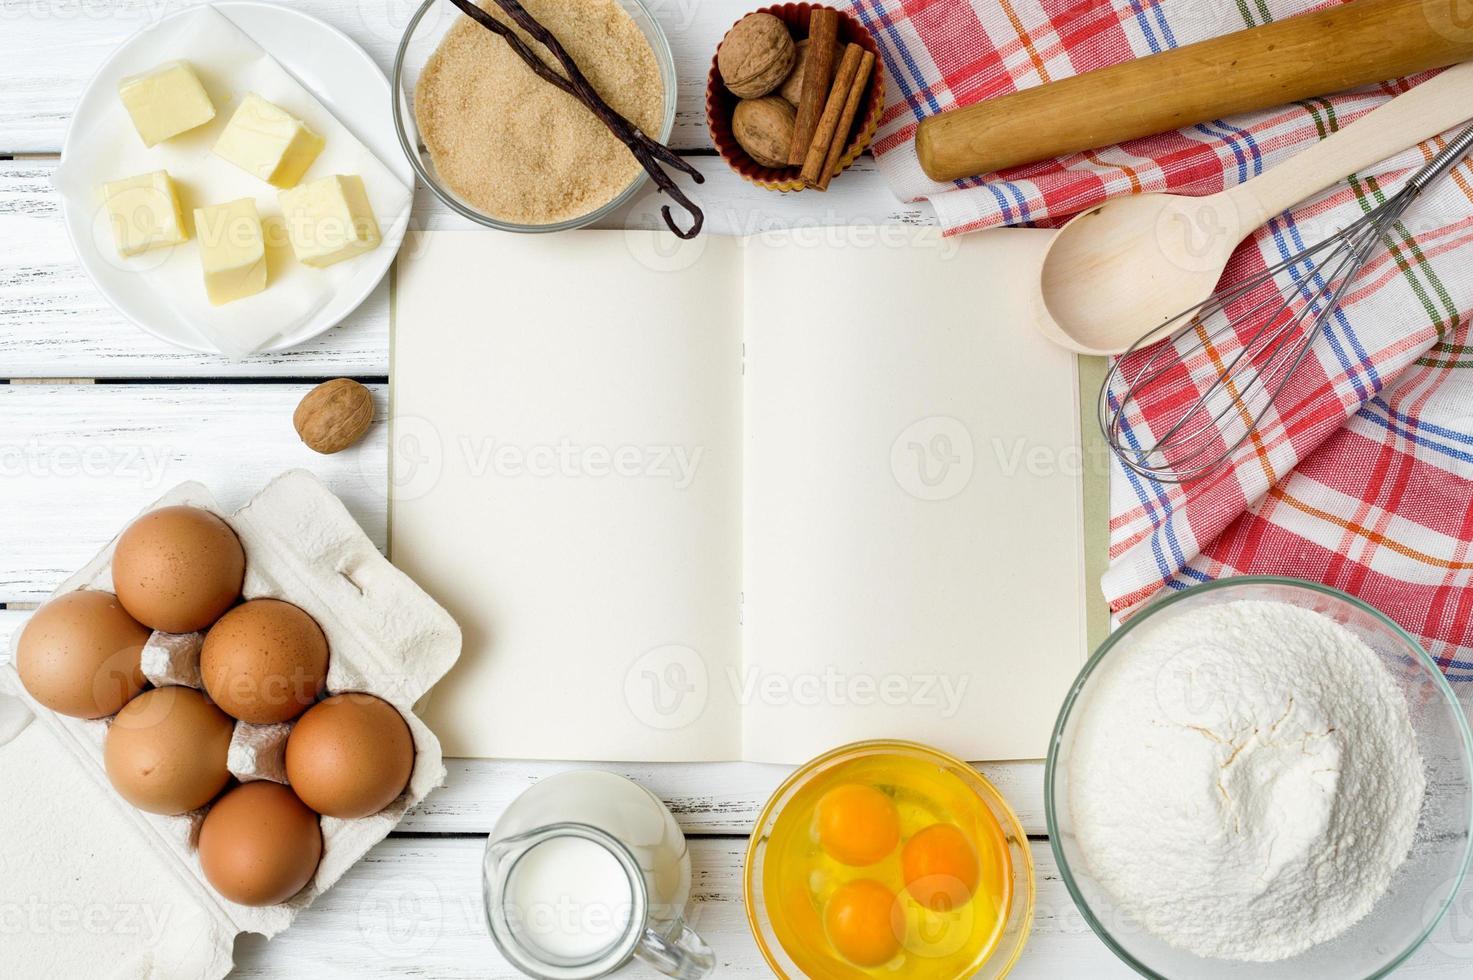 receptbok bakgrund foto